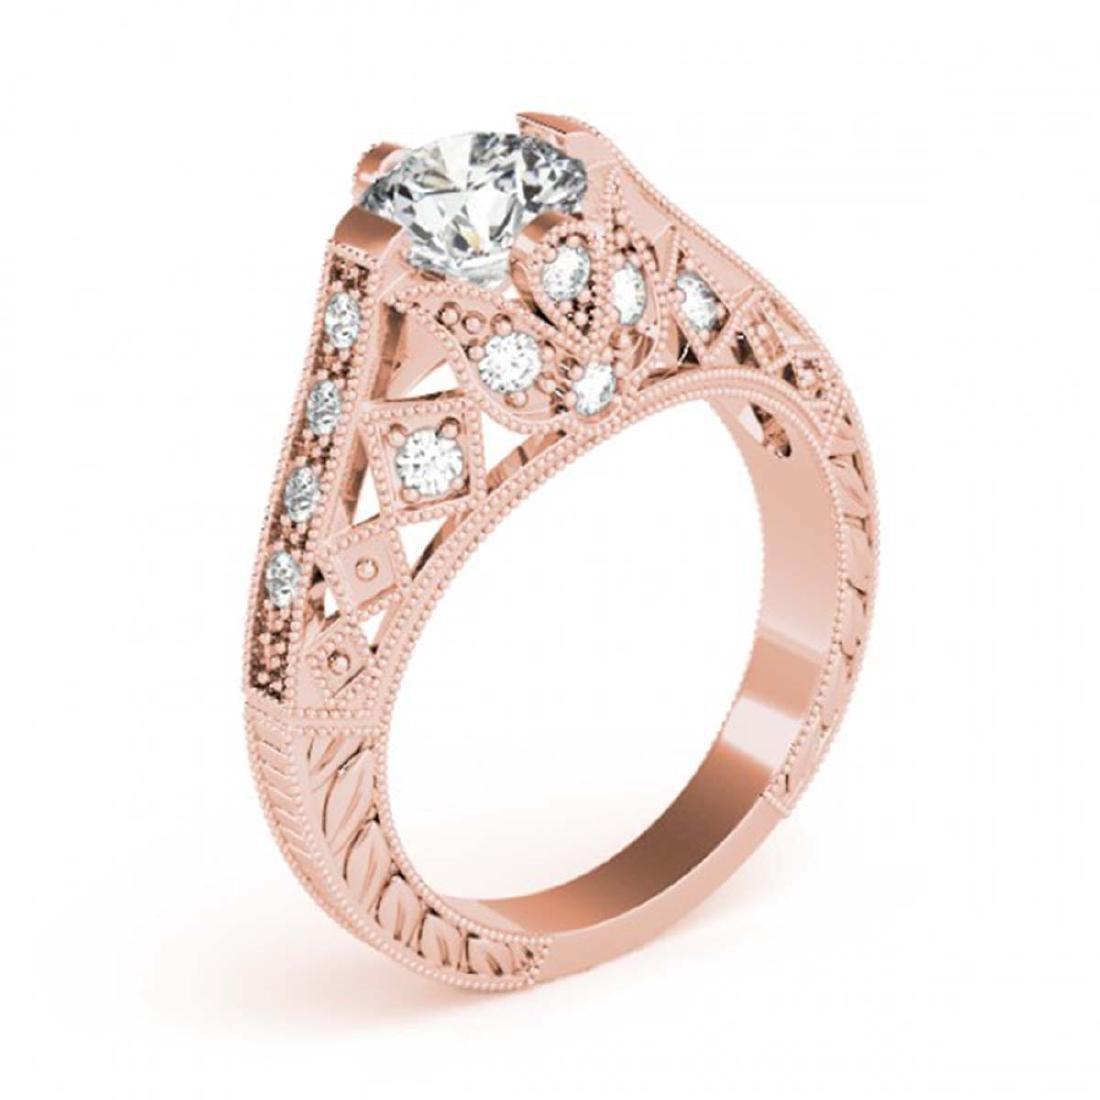 1.25 ctw VS/SI Diamond Ring 14K Rose Gold - REF-271R3K - 3